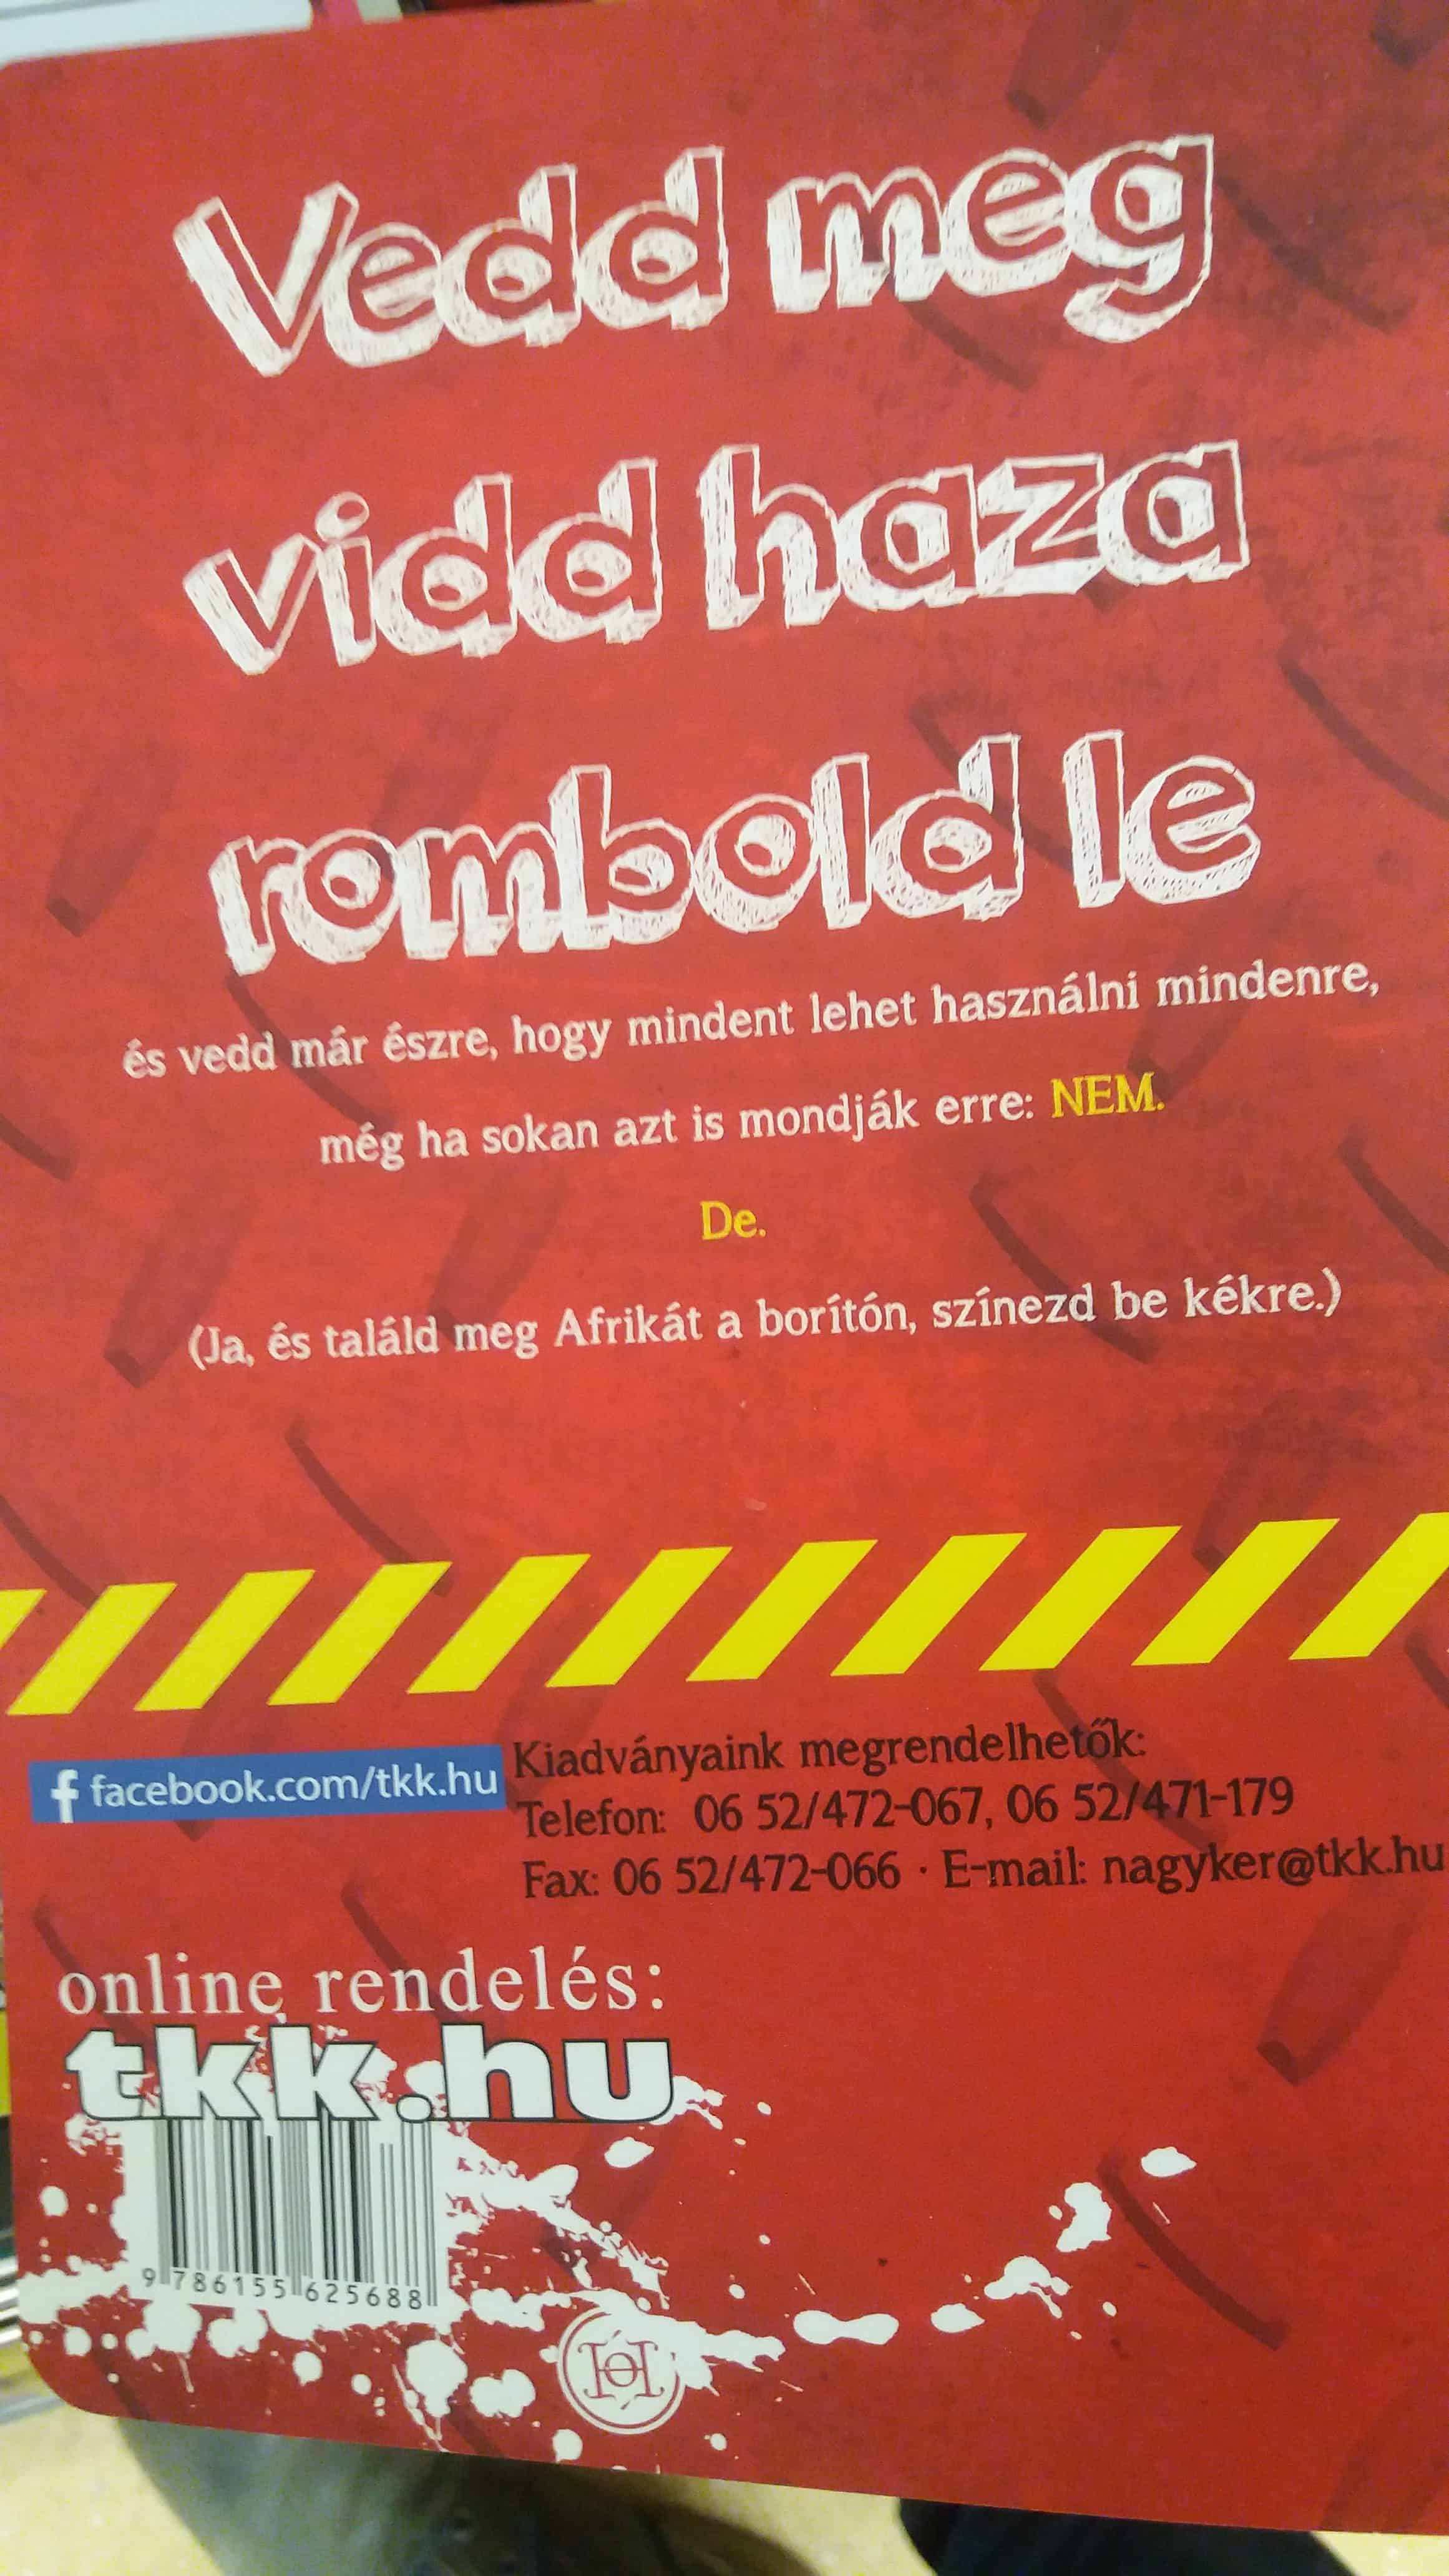 romboldle7